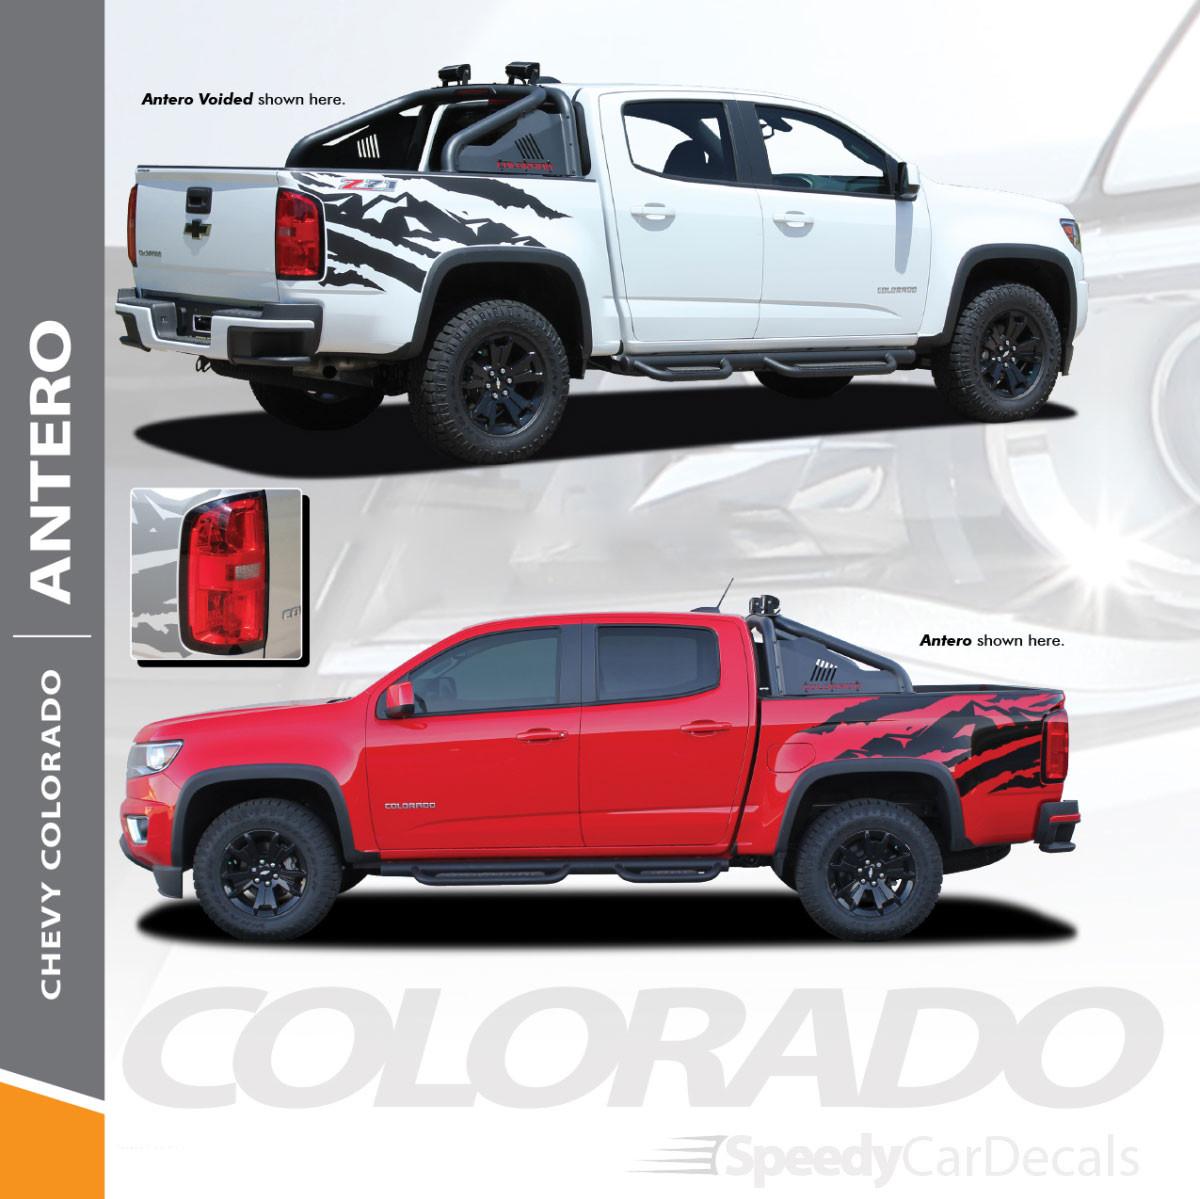 2015-2020 Chevy Colorado ANTERO Side Stripes and Graphics